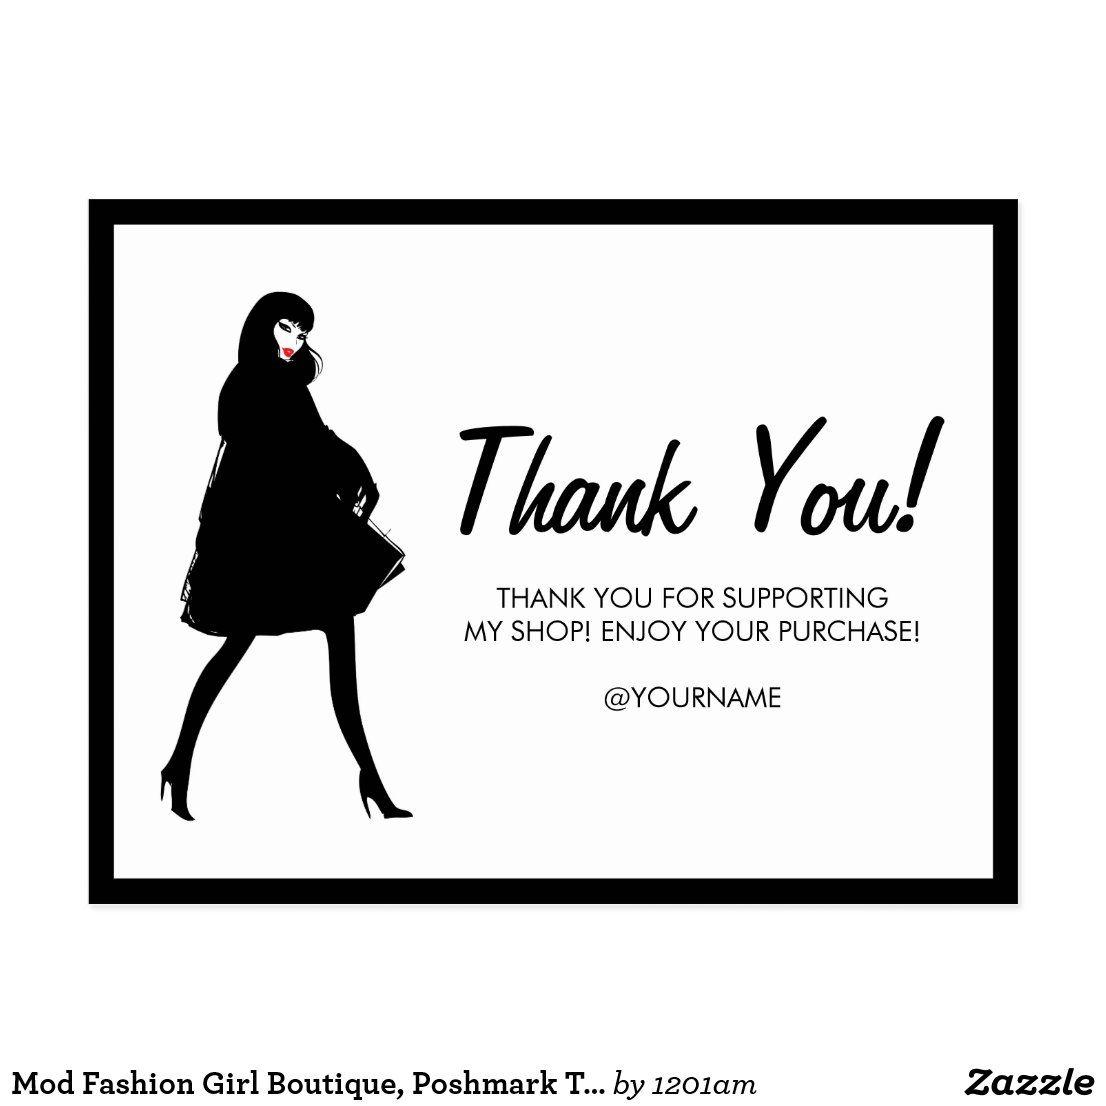 Mod fashion girl boutique poshmark thank you postcard